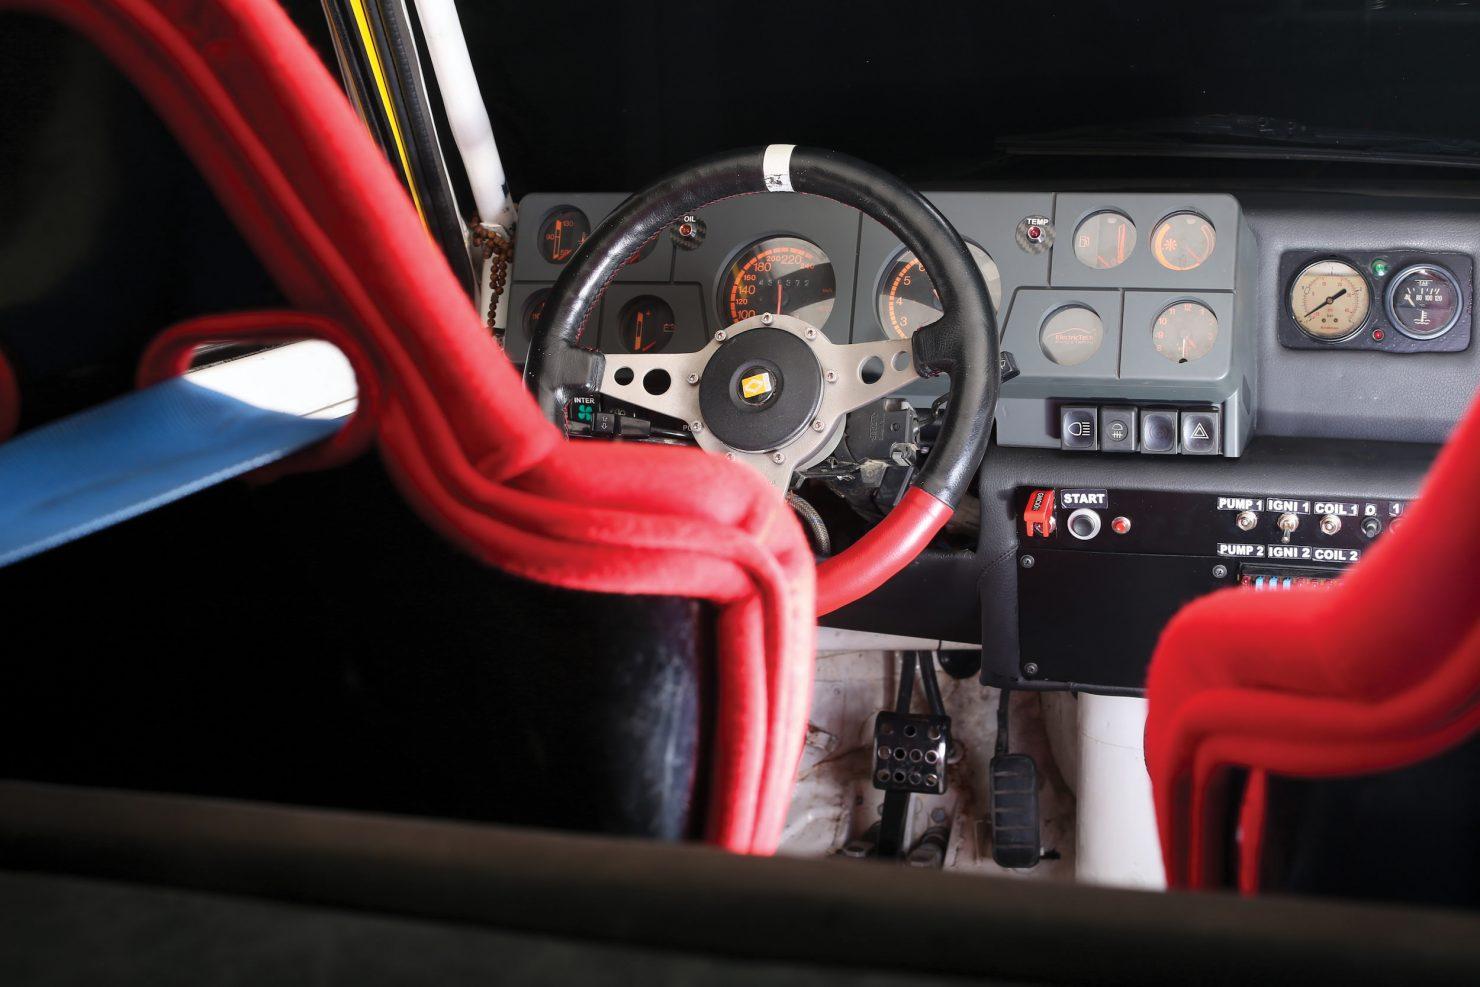 Renault 5 Turbo 8 1480x987 - 1980 Renault 5 Turbo